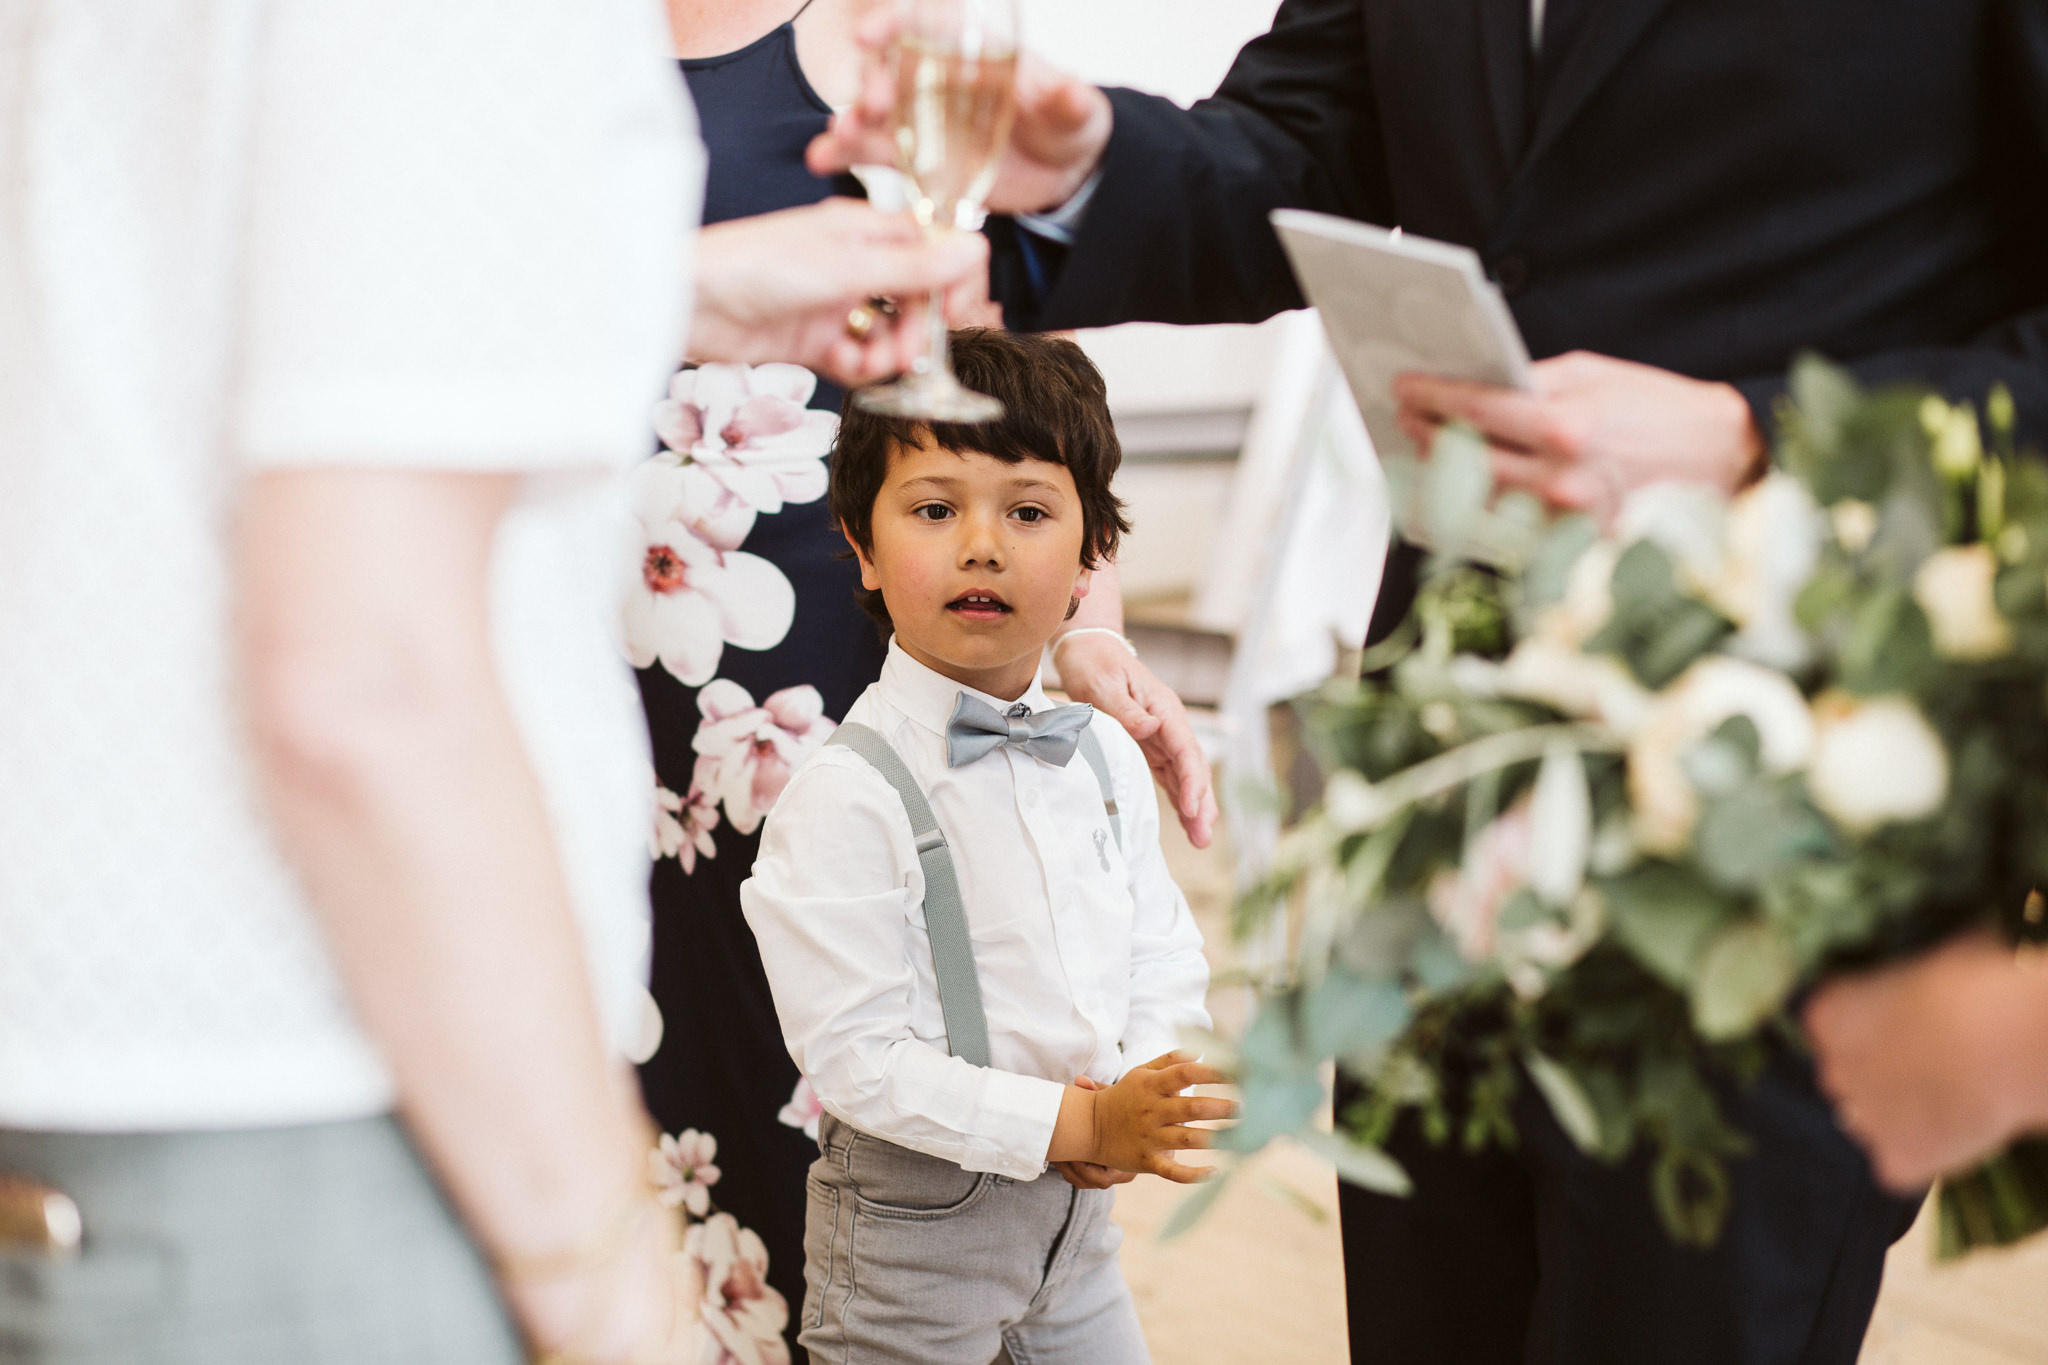 baltic-wedding-margarita-hope (32).jpg